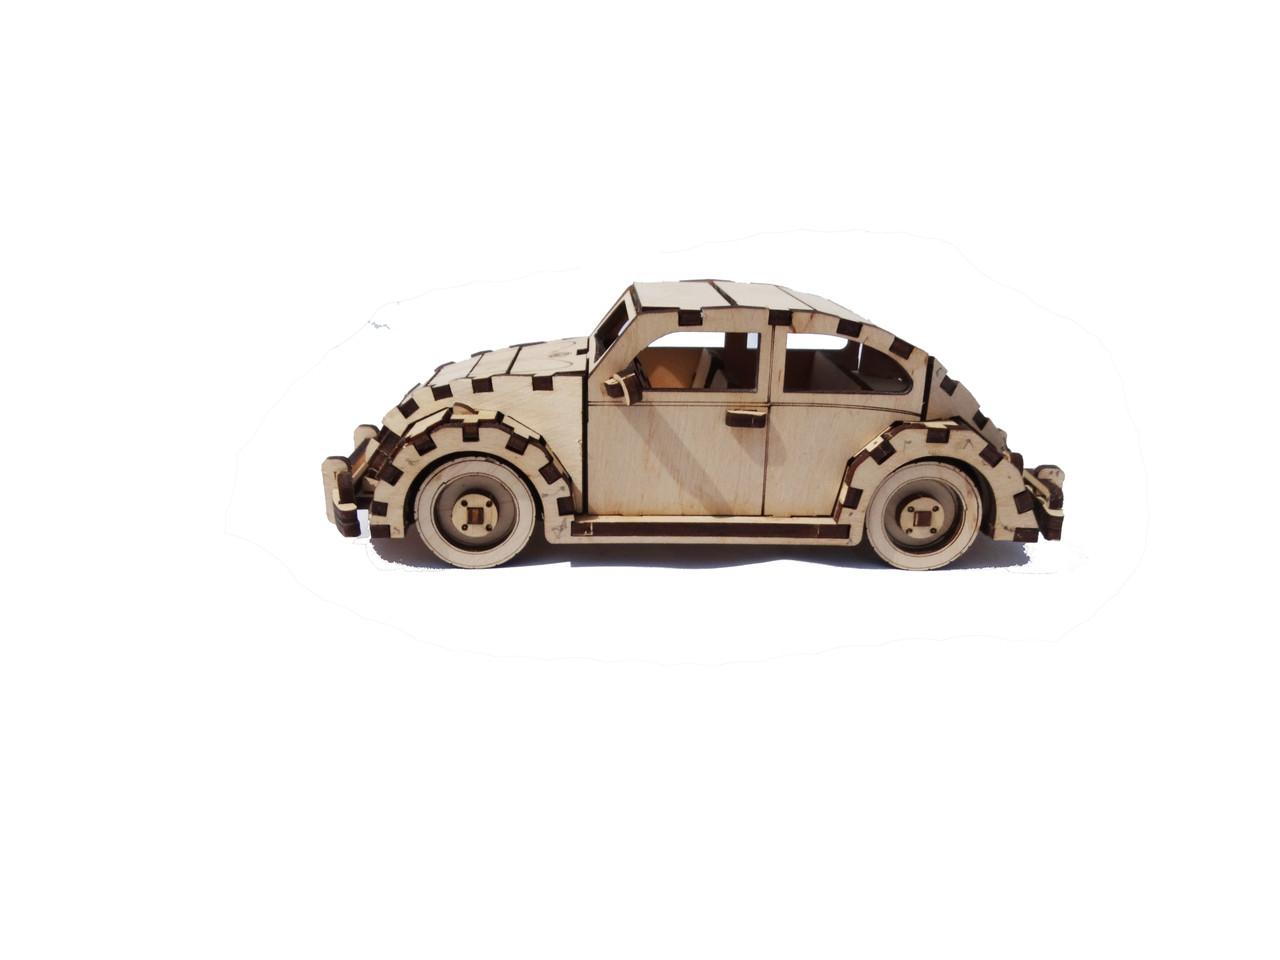 Дерев'яний конструктор 3D пазл Volkswagen